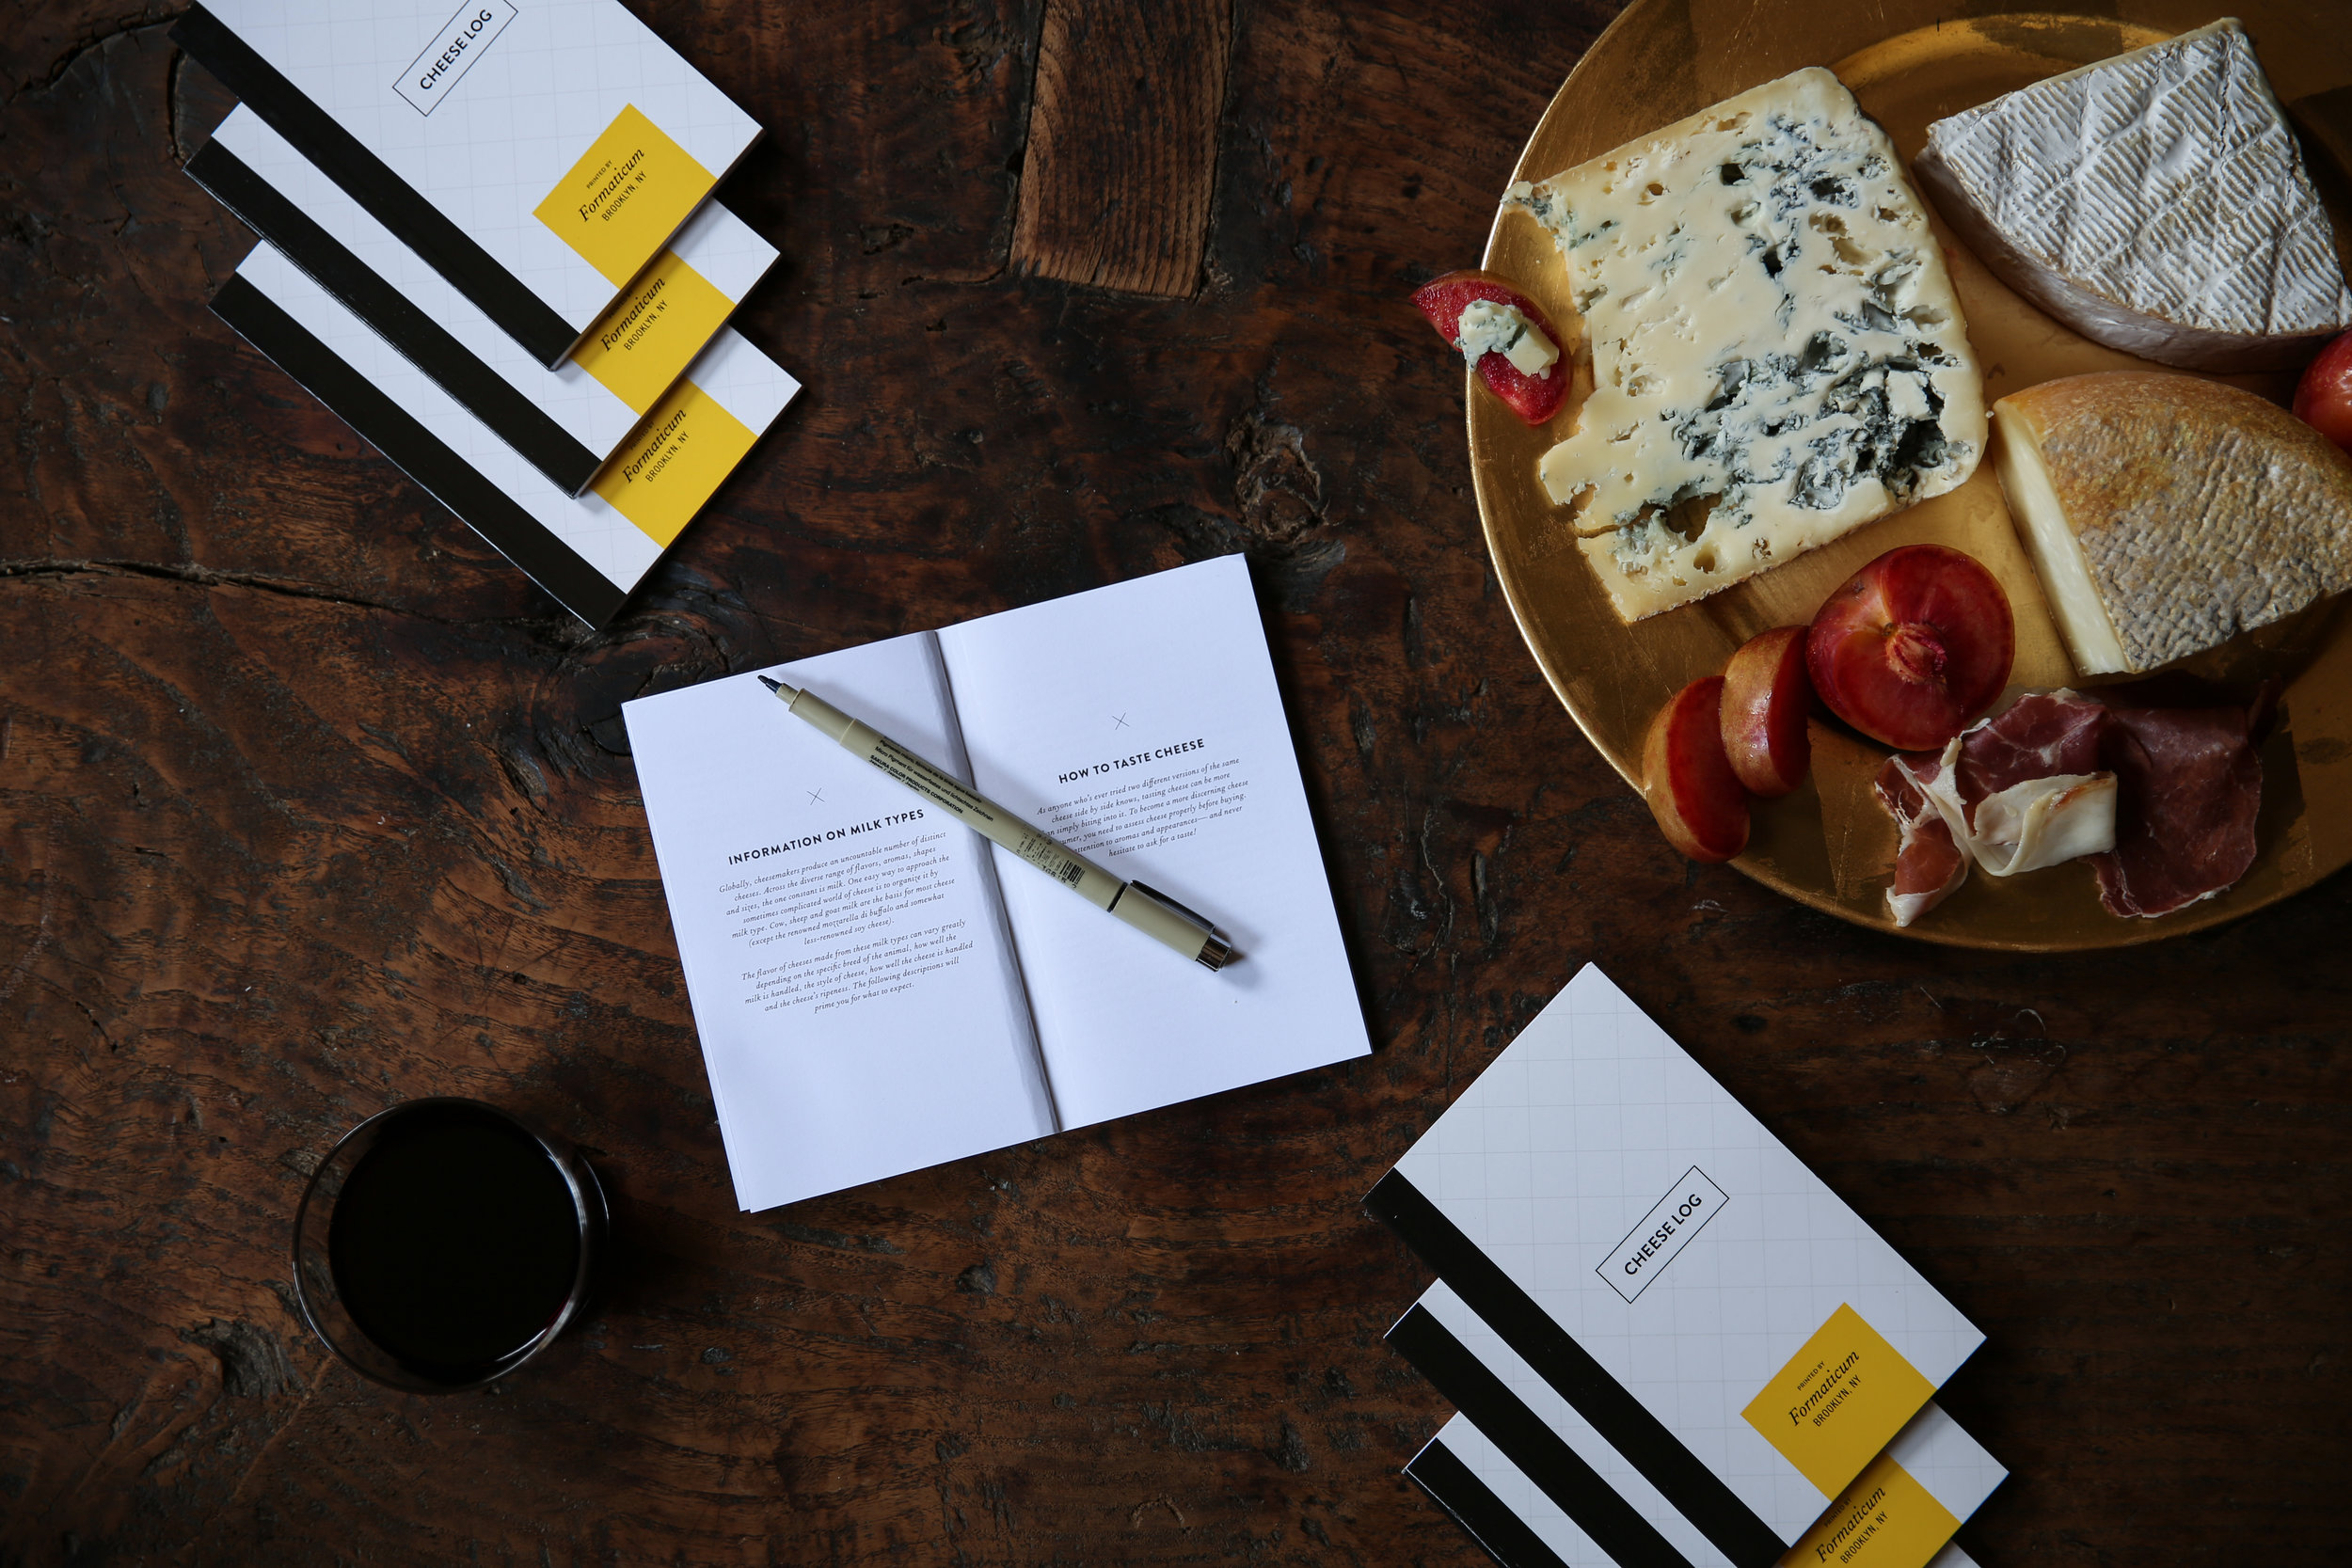 cheese-logs-FORMATICUM4227.jpg